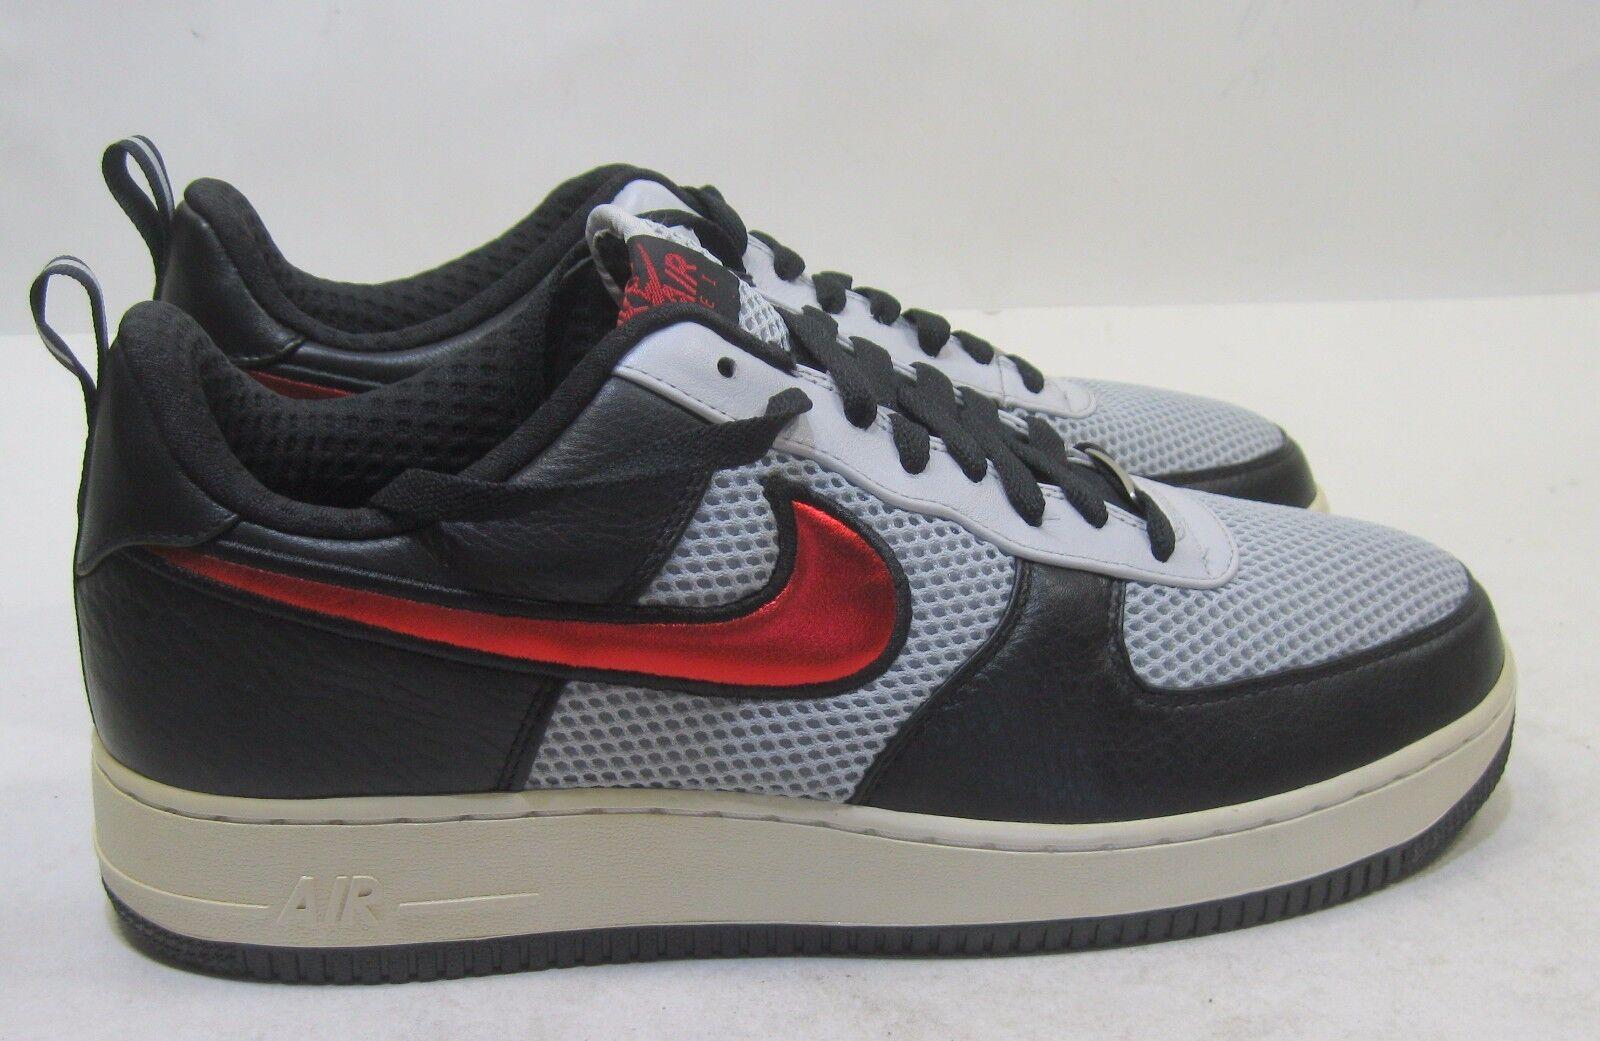 Nike air force 1 basso premio 318775-061 argento metallico / vrsty red taglia